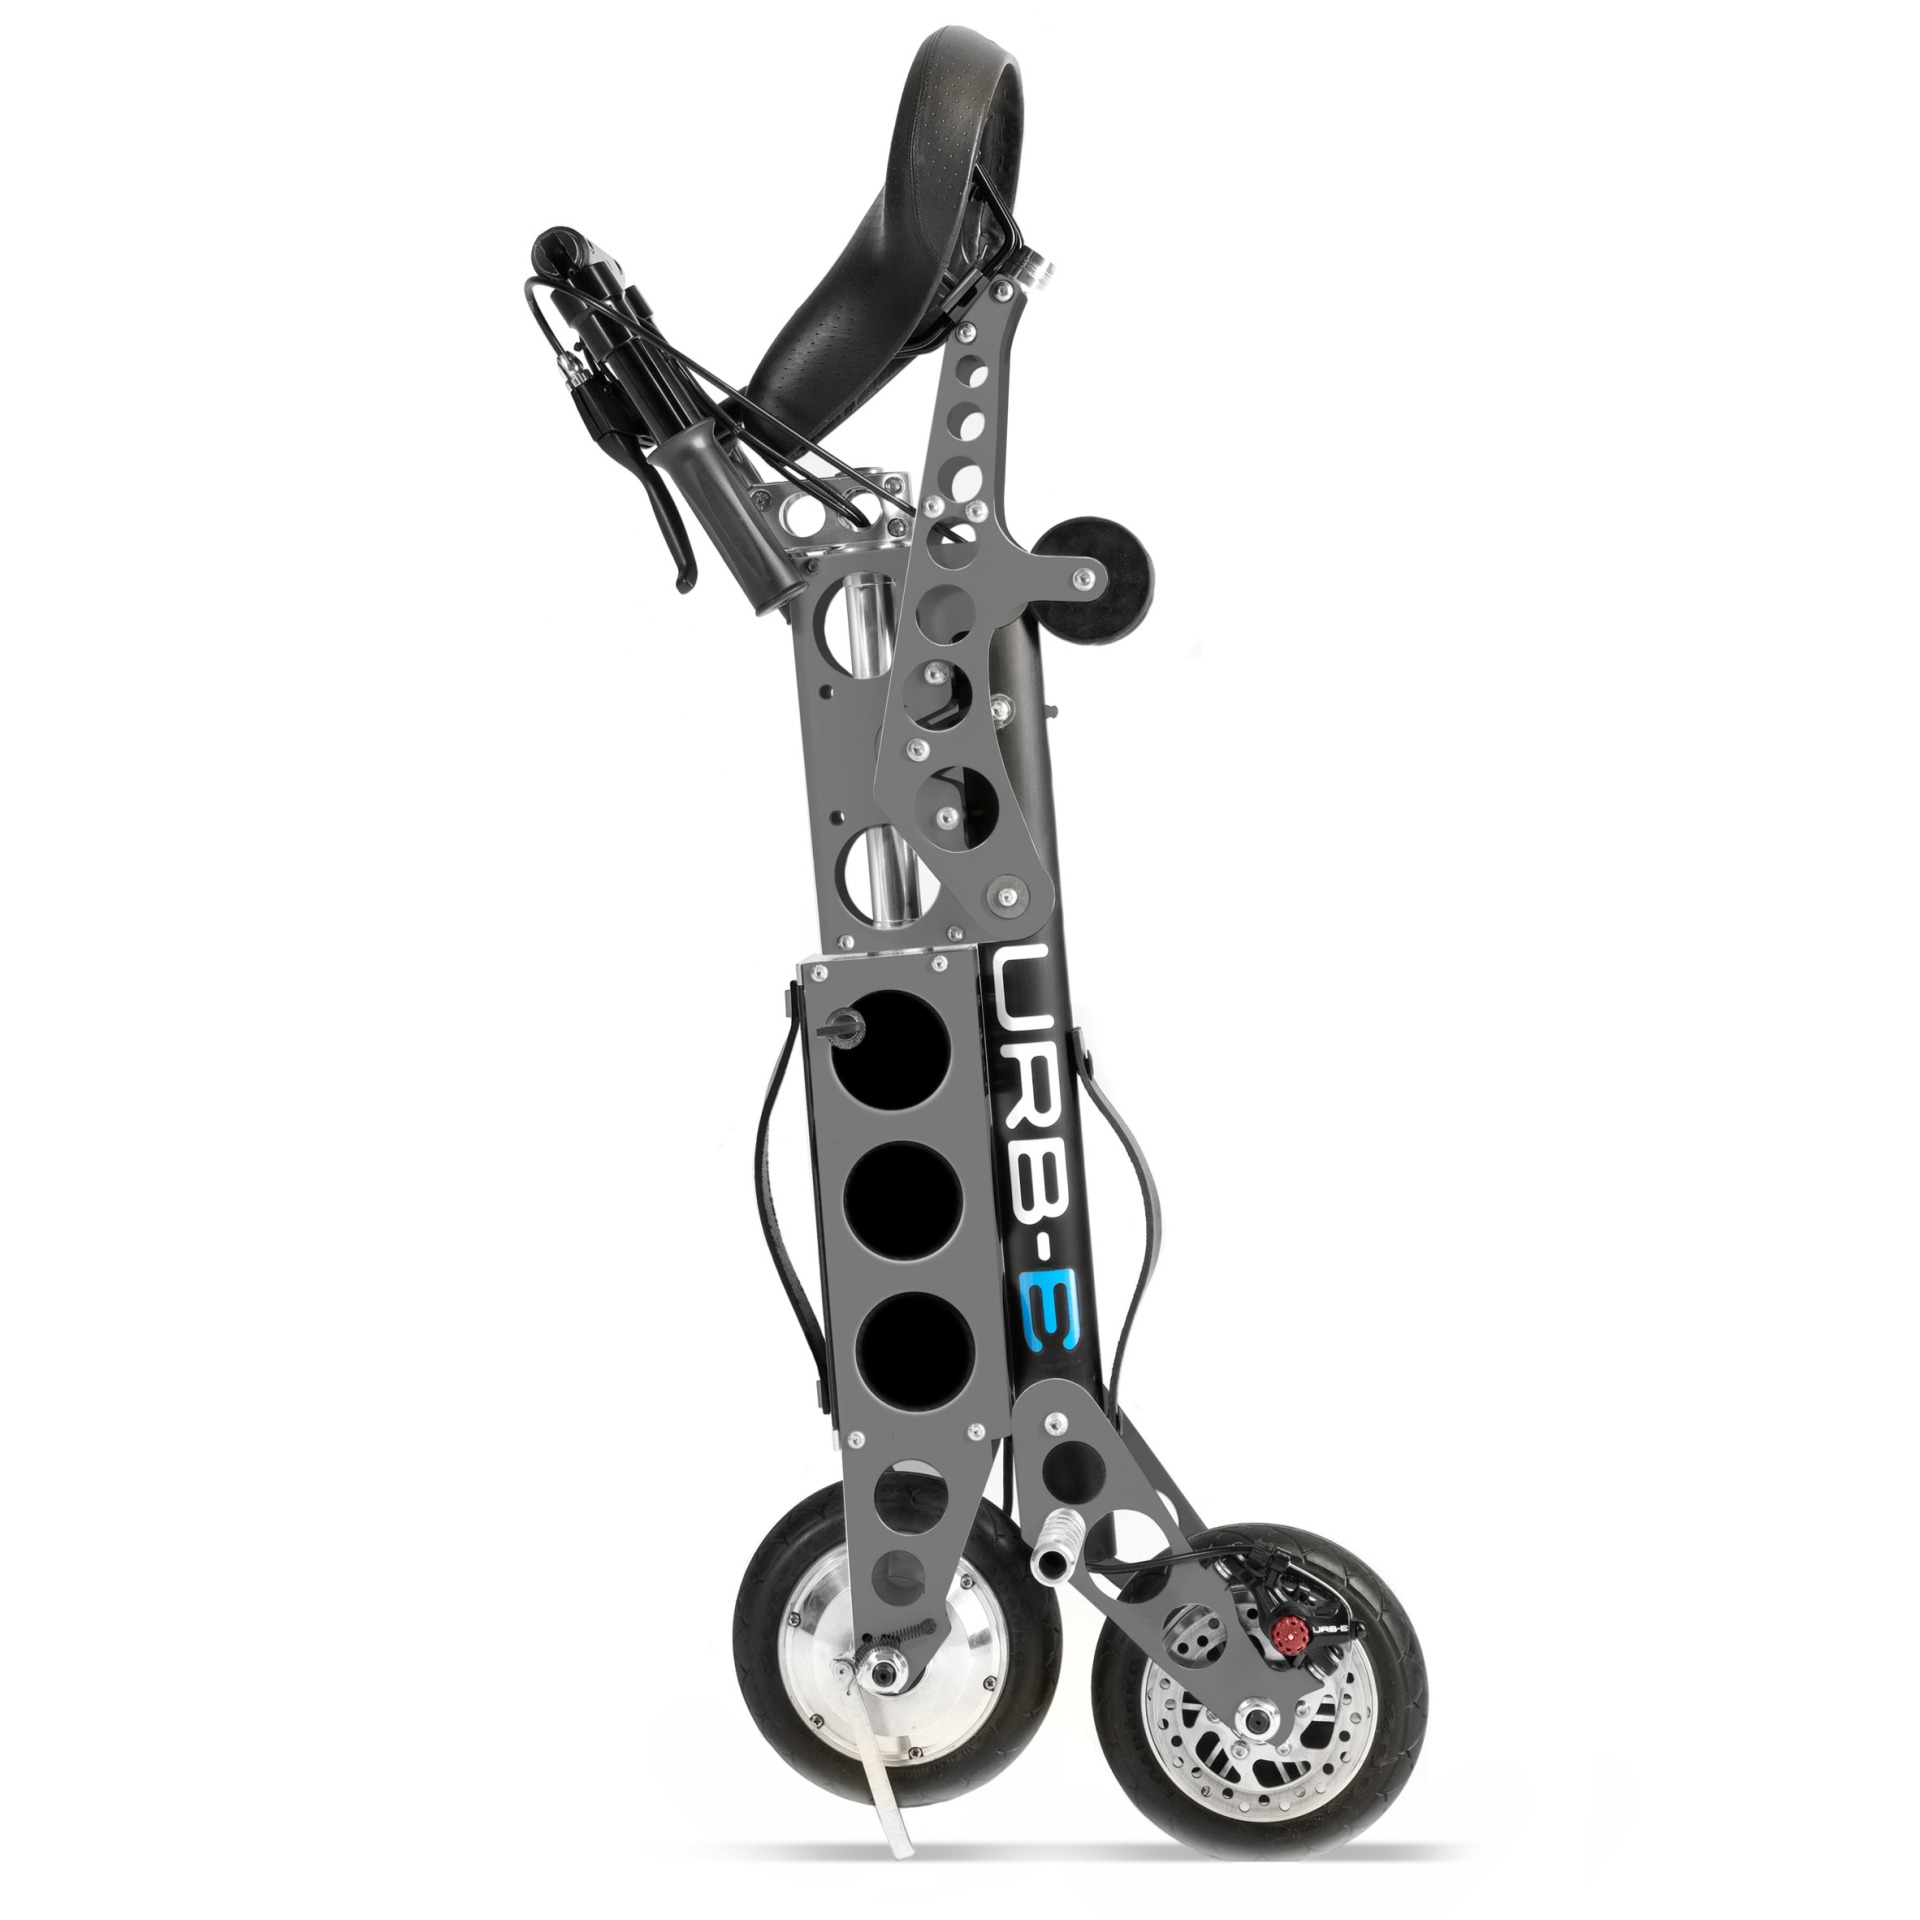 urb-e-scooter-design-transport-electric-vehicles-ces_dezeen_2364_col_2